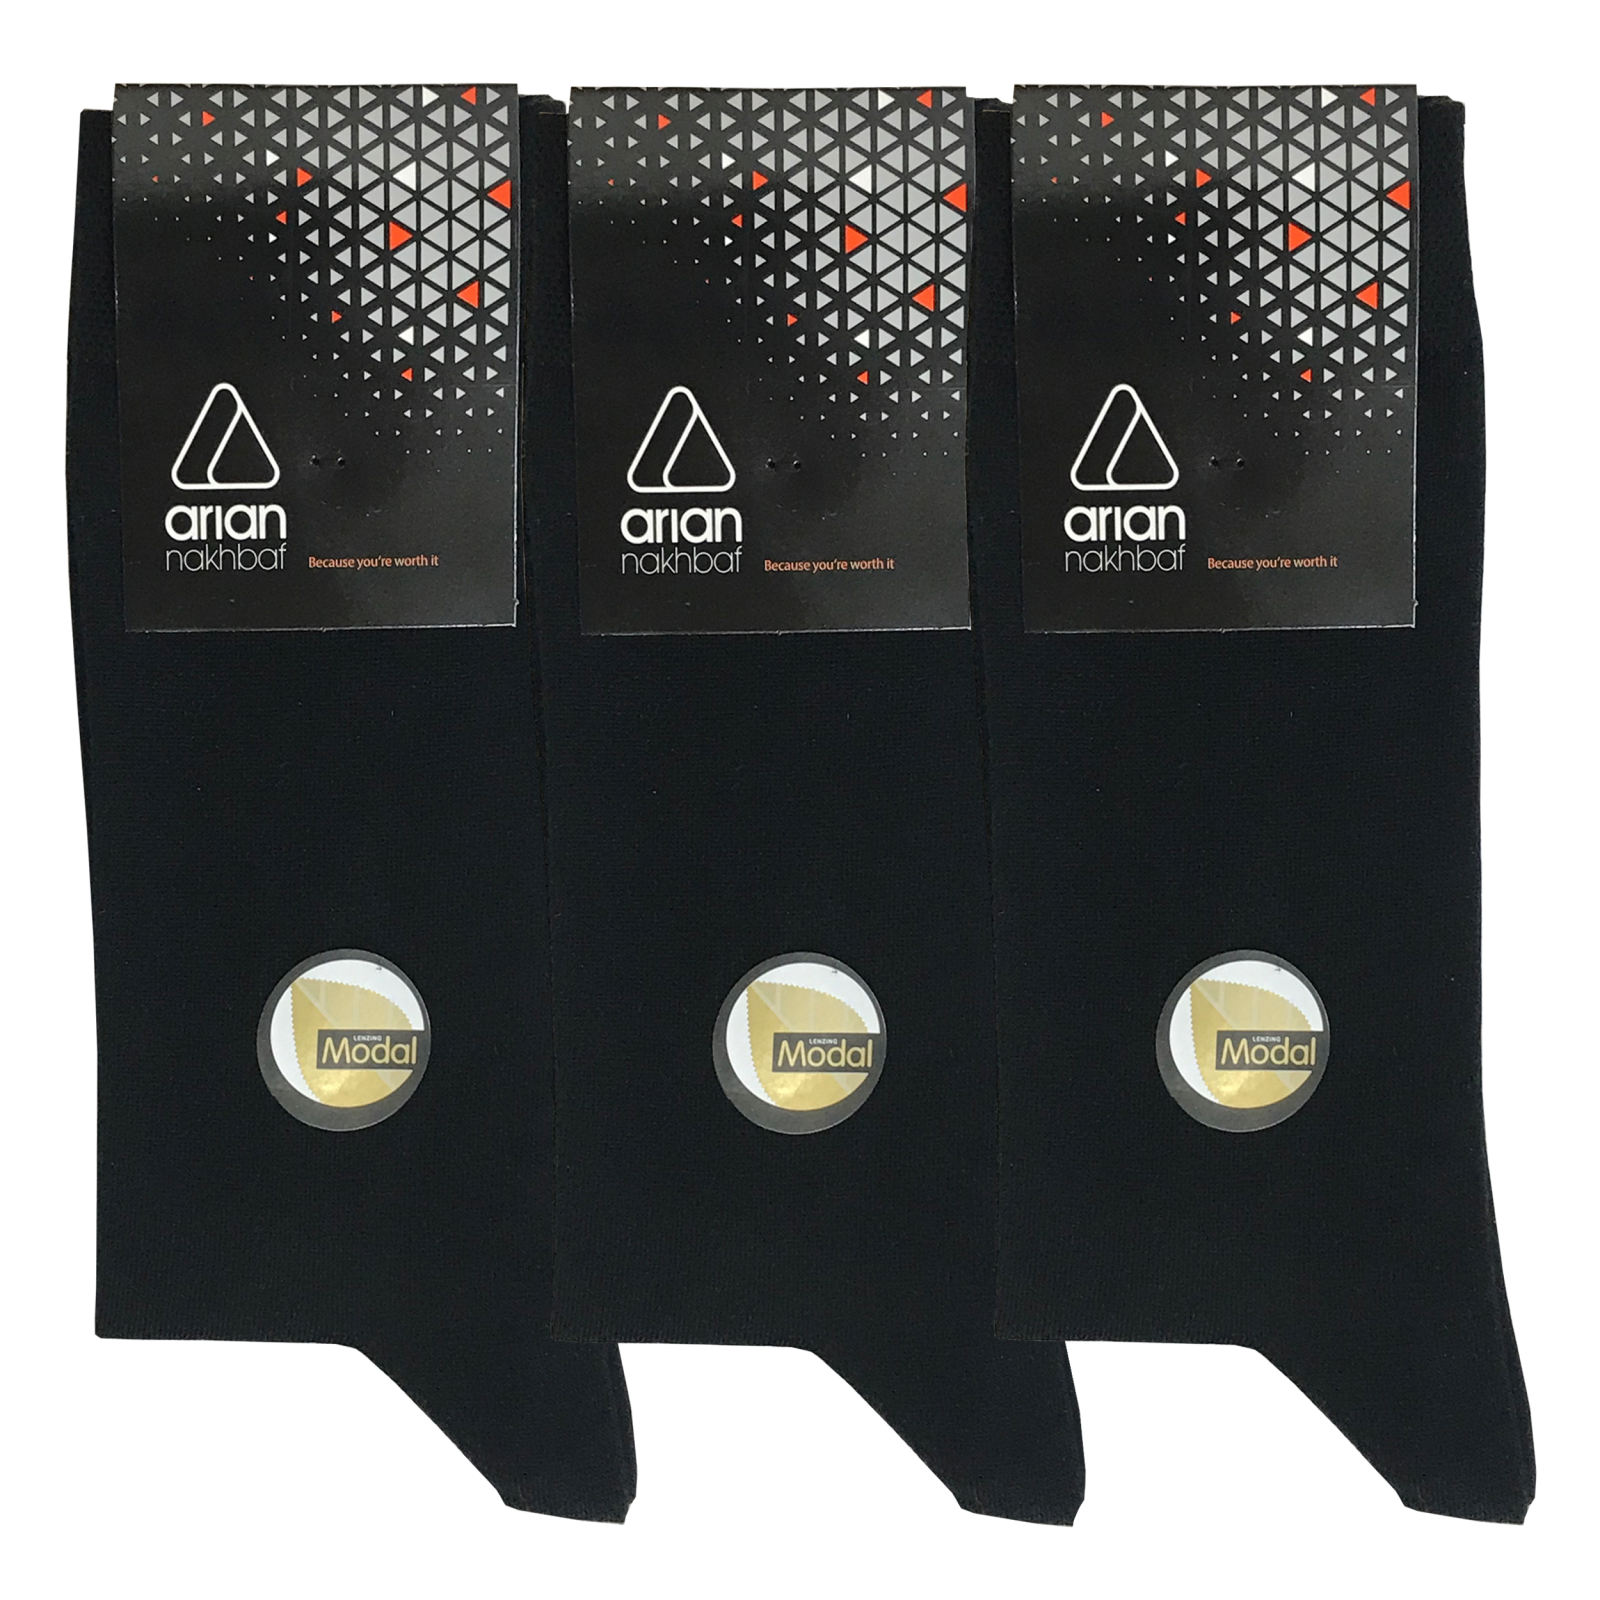 جوراب مردانه آریان نخ باف کد52217 بسته 3 عددی -  - 1